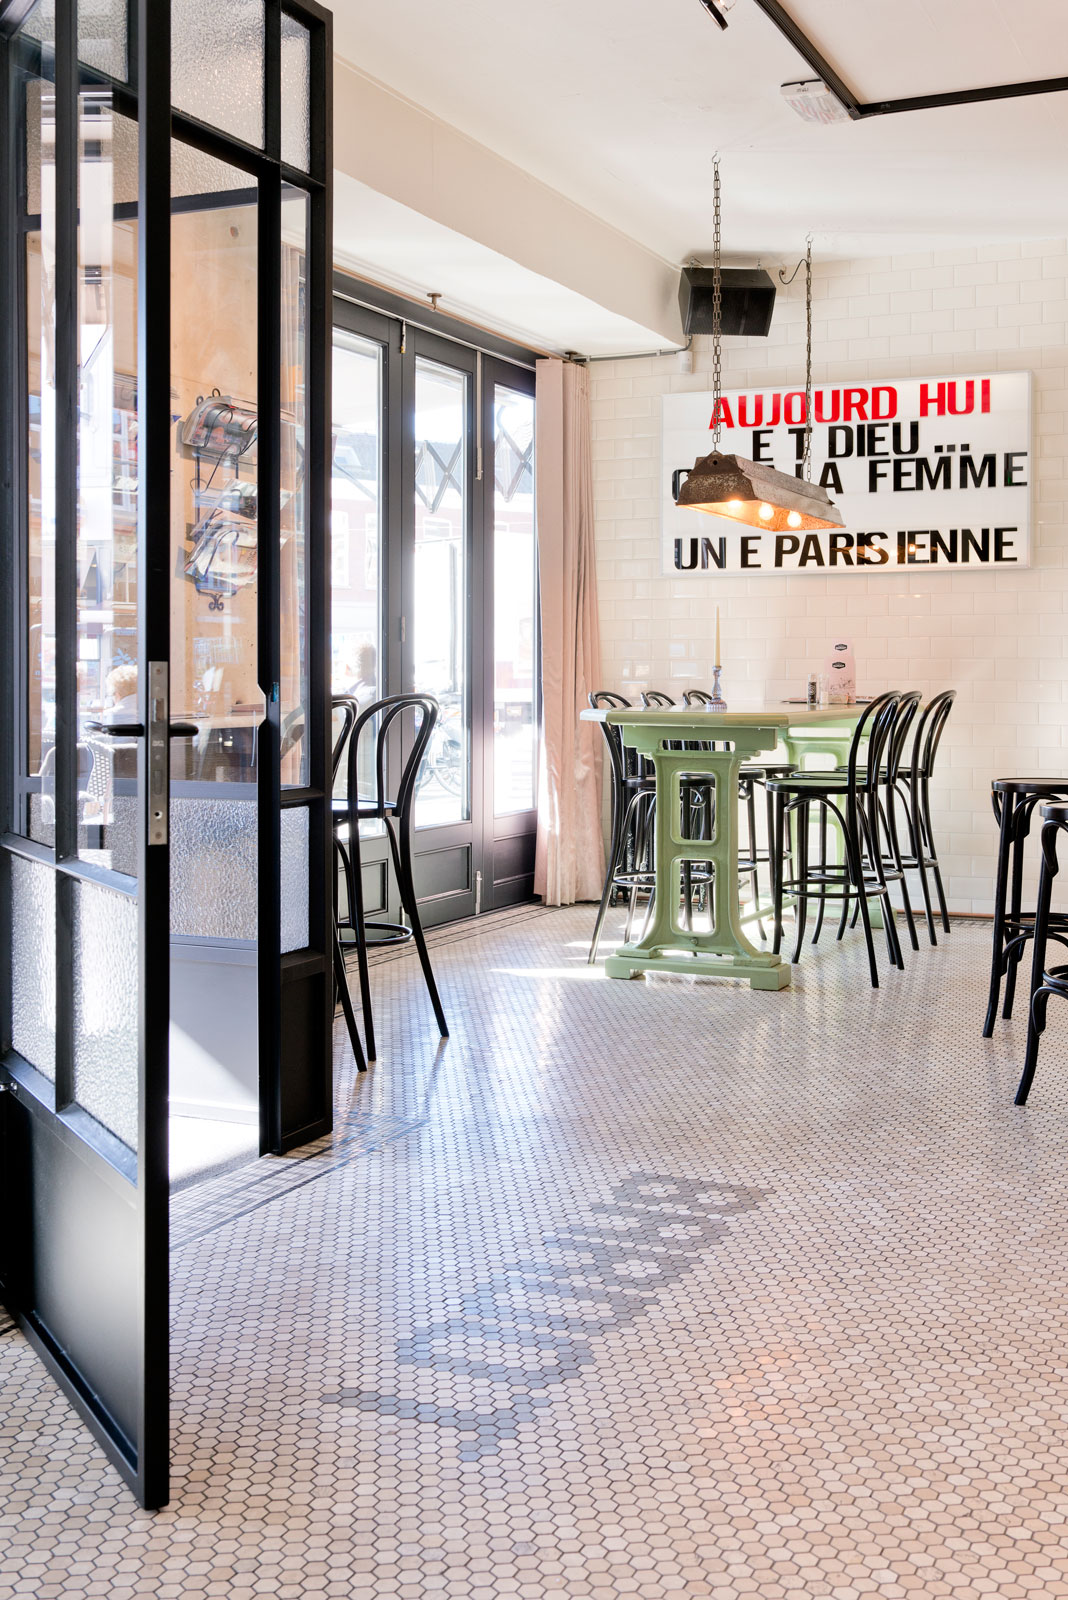 6e92dbff ab24 4a33 8870 f187570dde35 dsc0030 copy Brasserie Bardot Restaurant